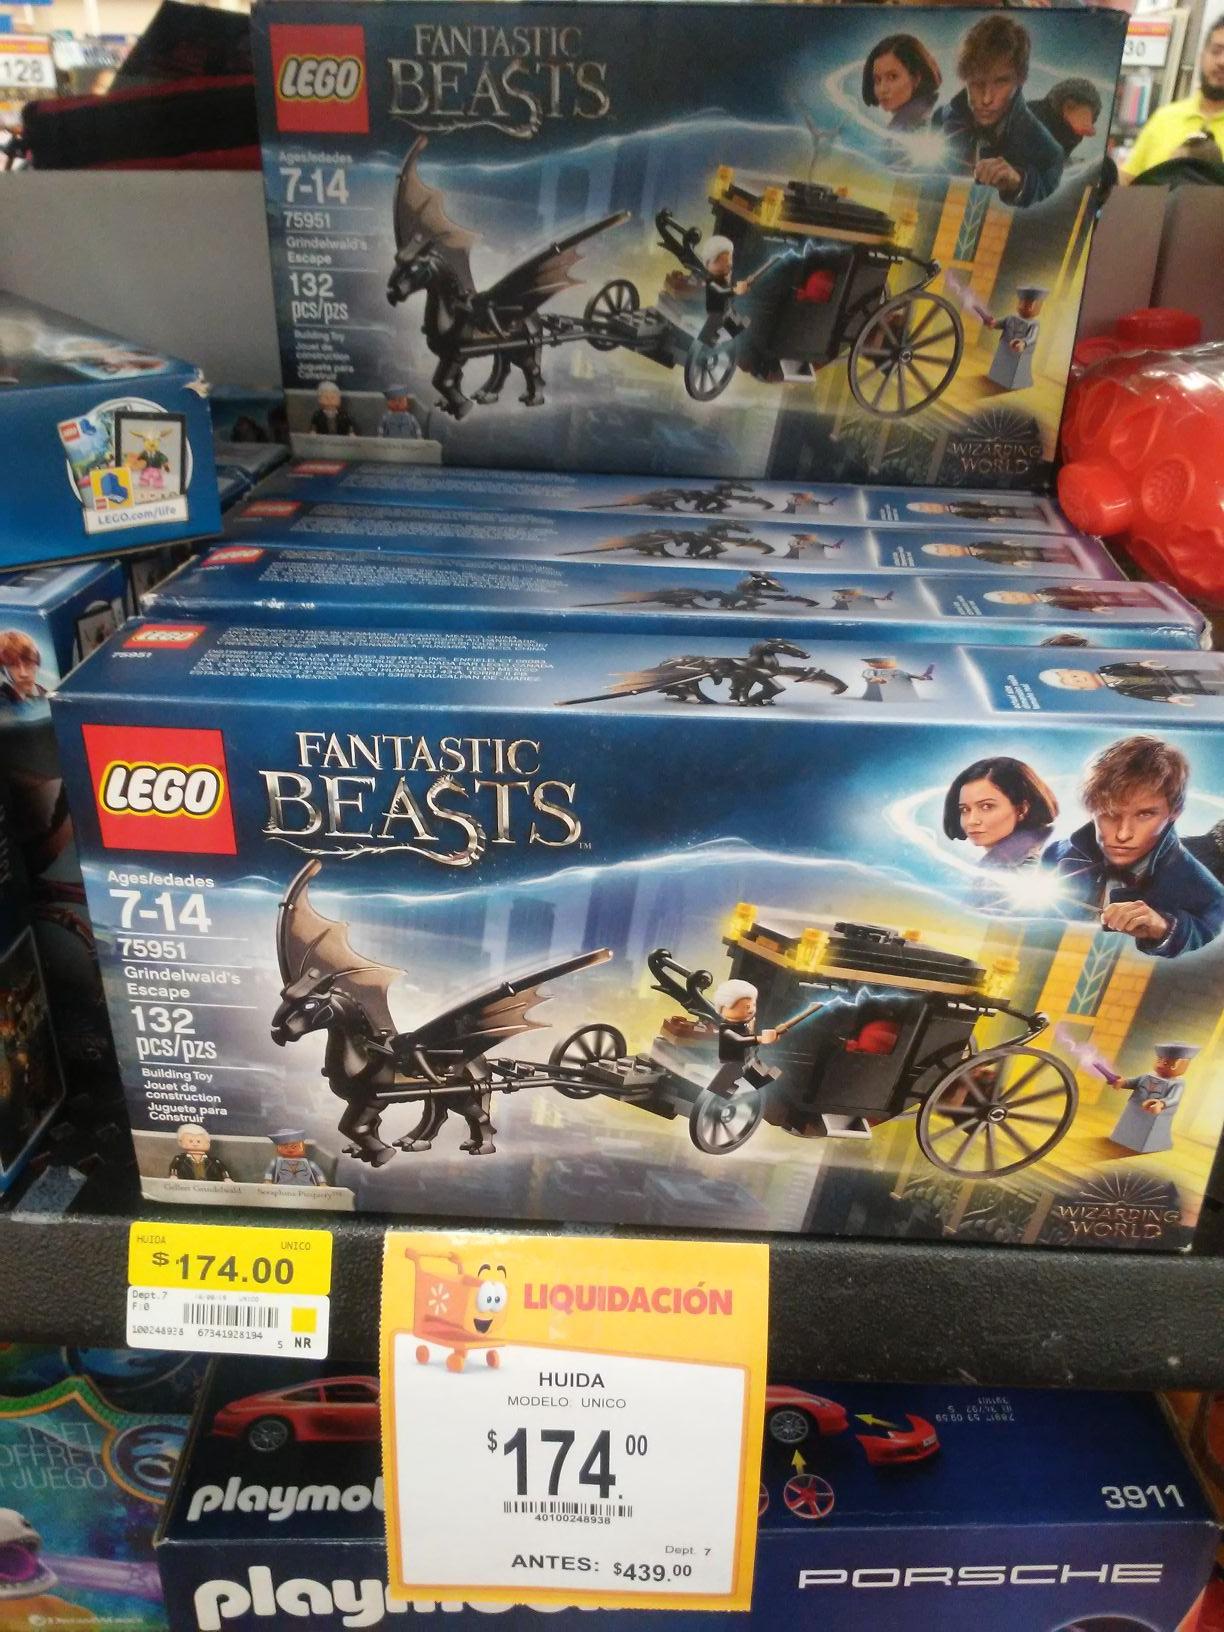 Walmart: Lego Fantastic Beasts